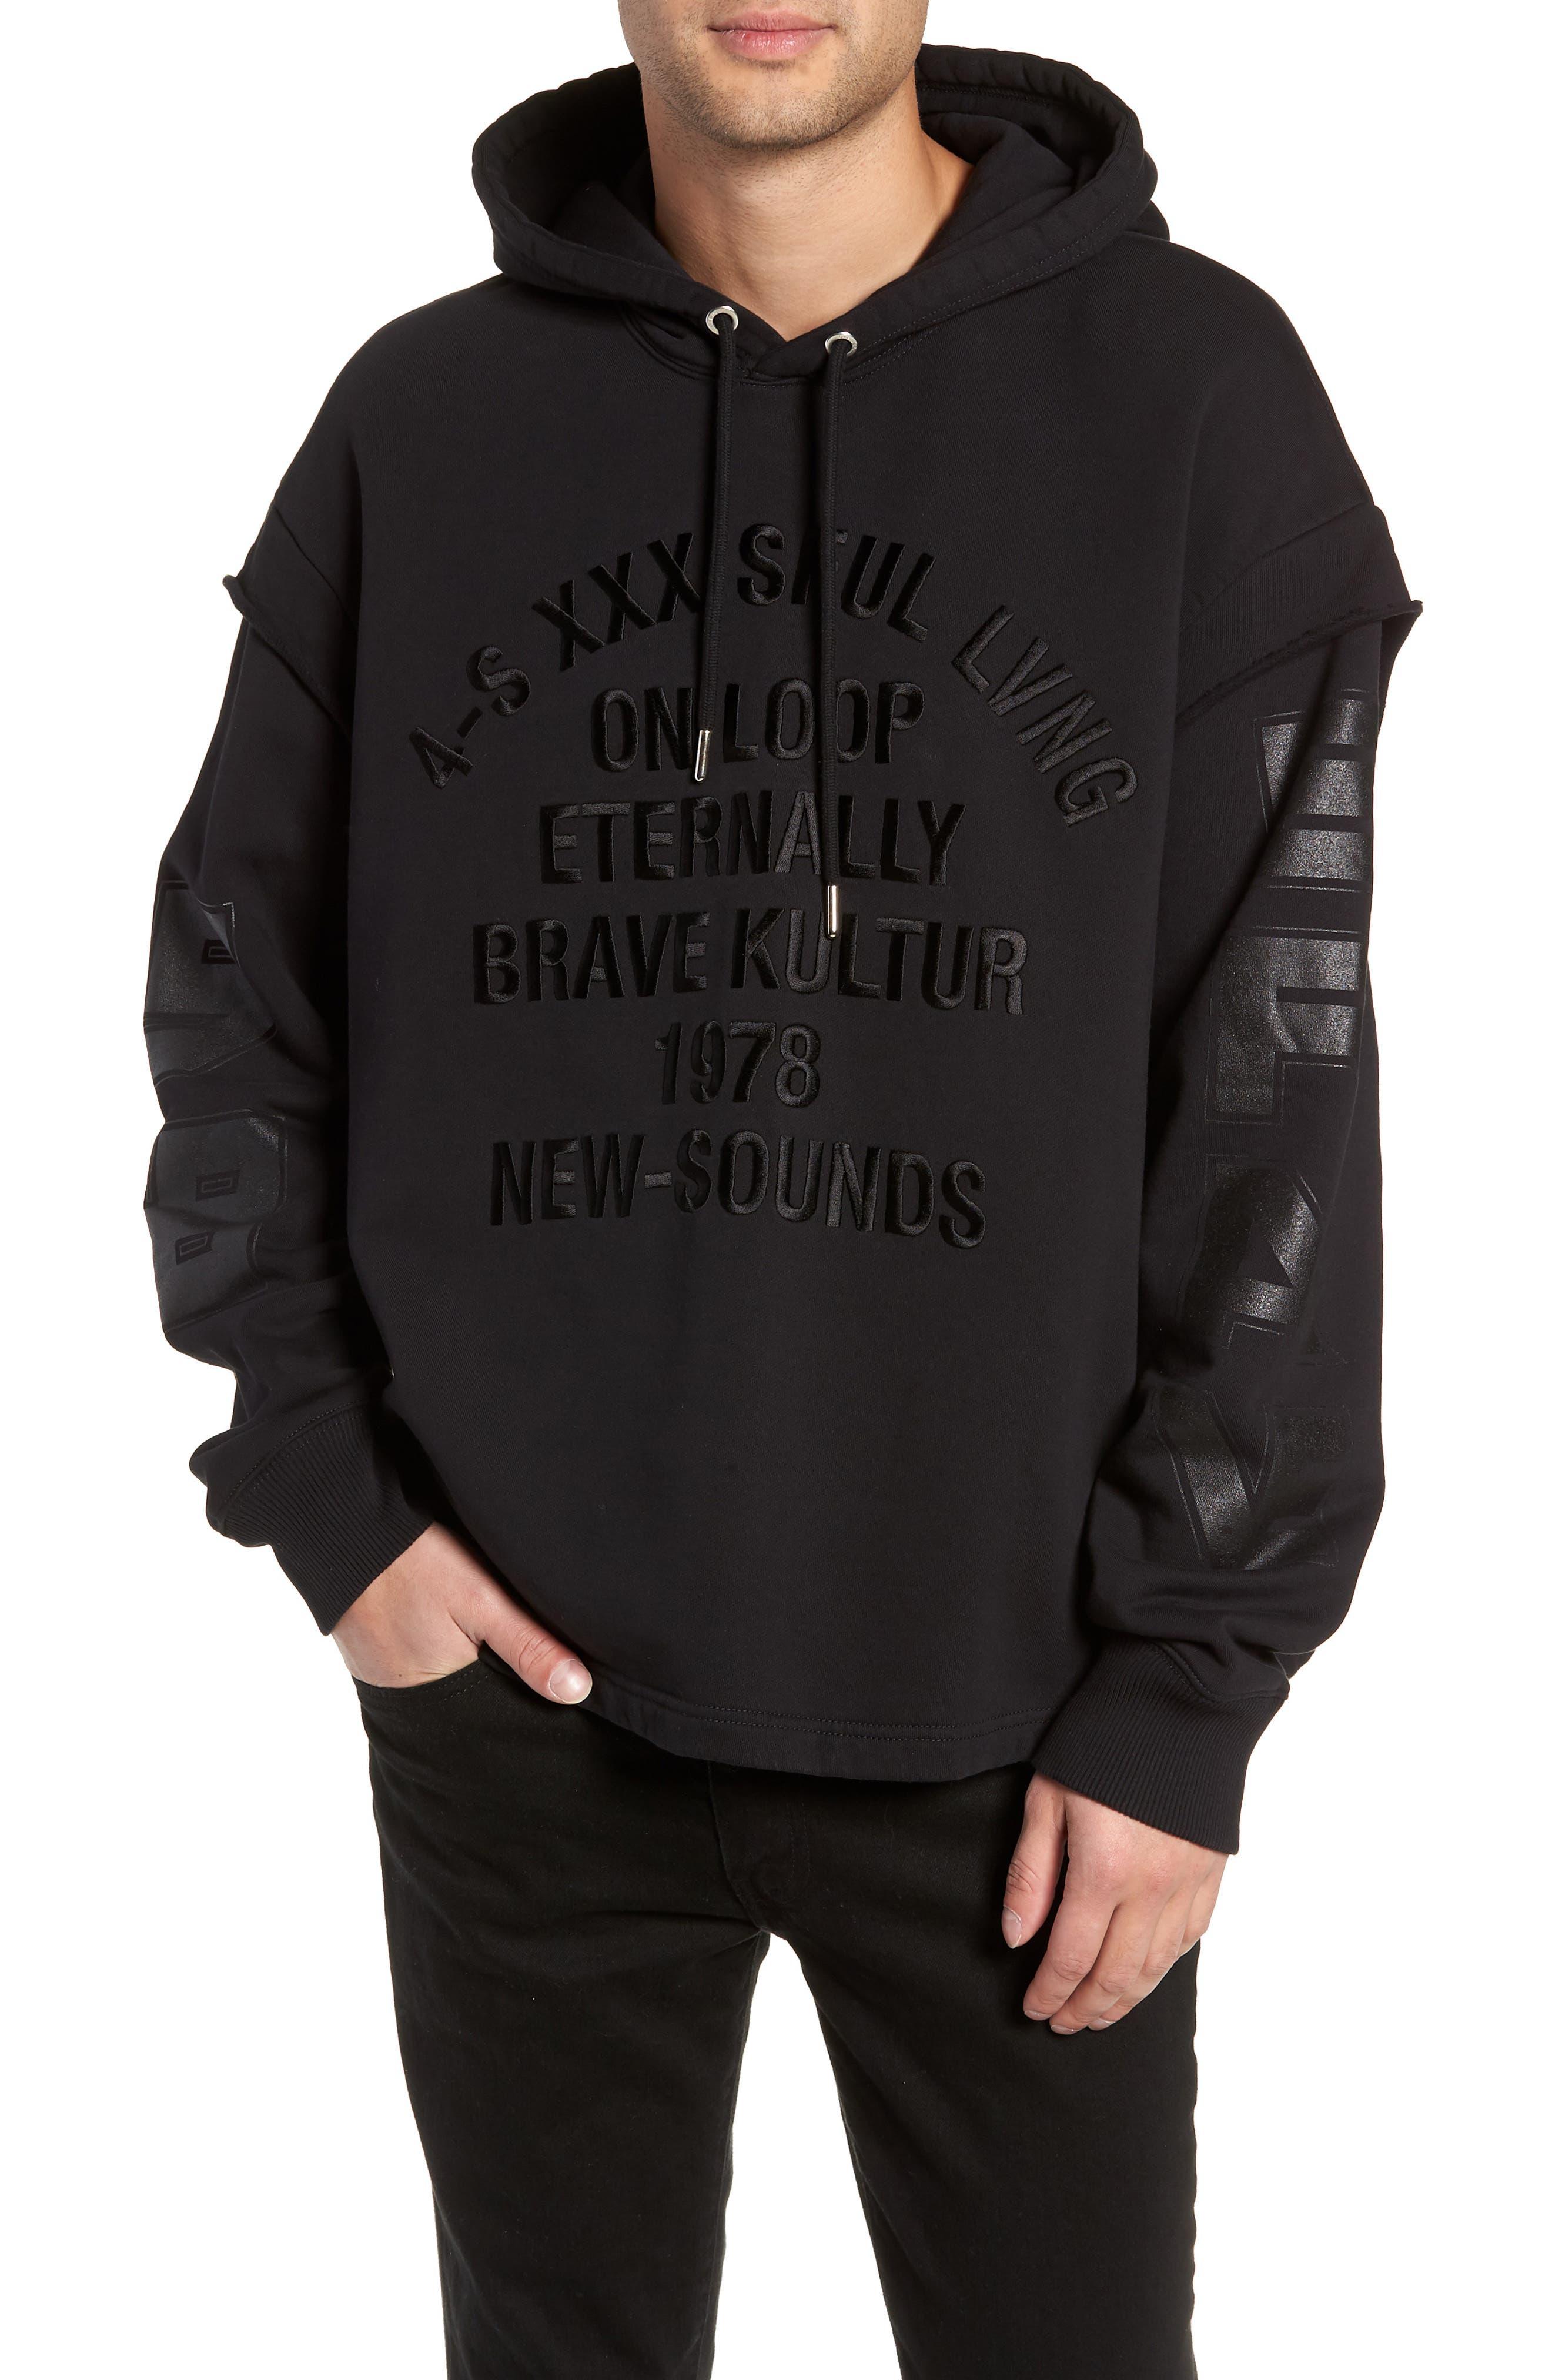 S-DRIVE-LS-XA Embroidered Hooded Sweatshirt,                             Main thumbnail 1, color,                             BLACK